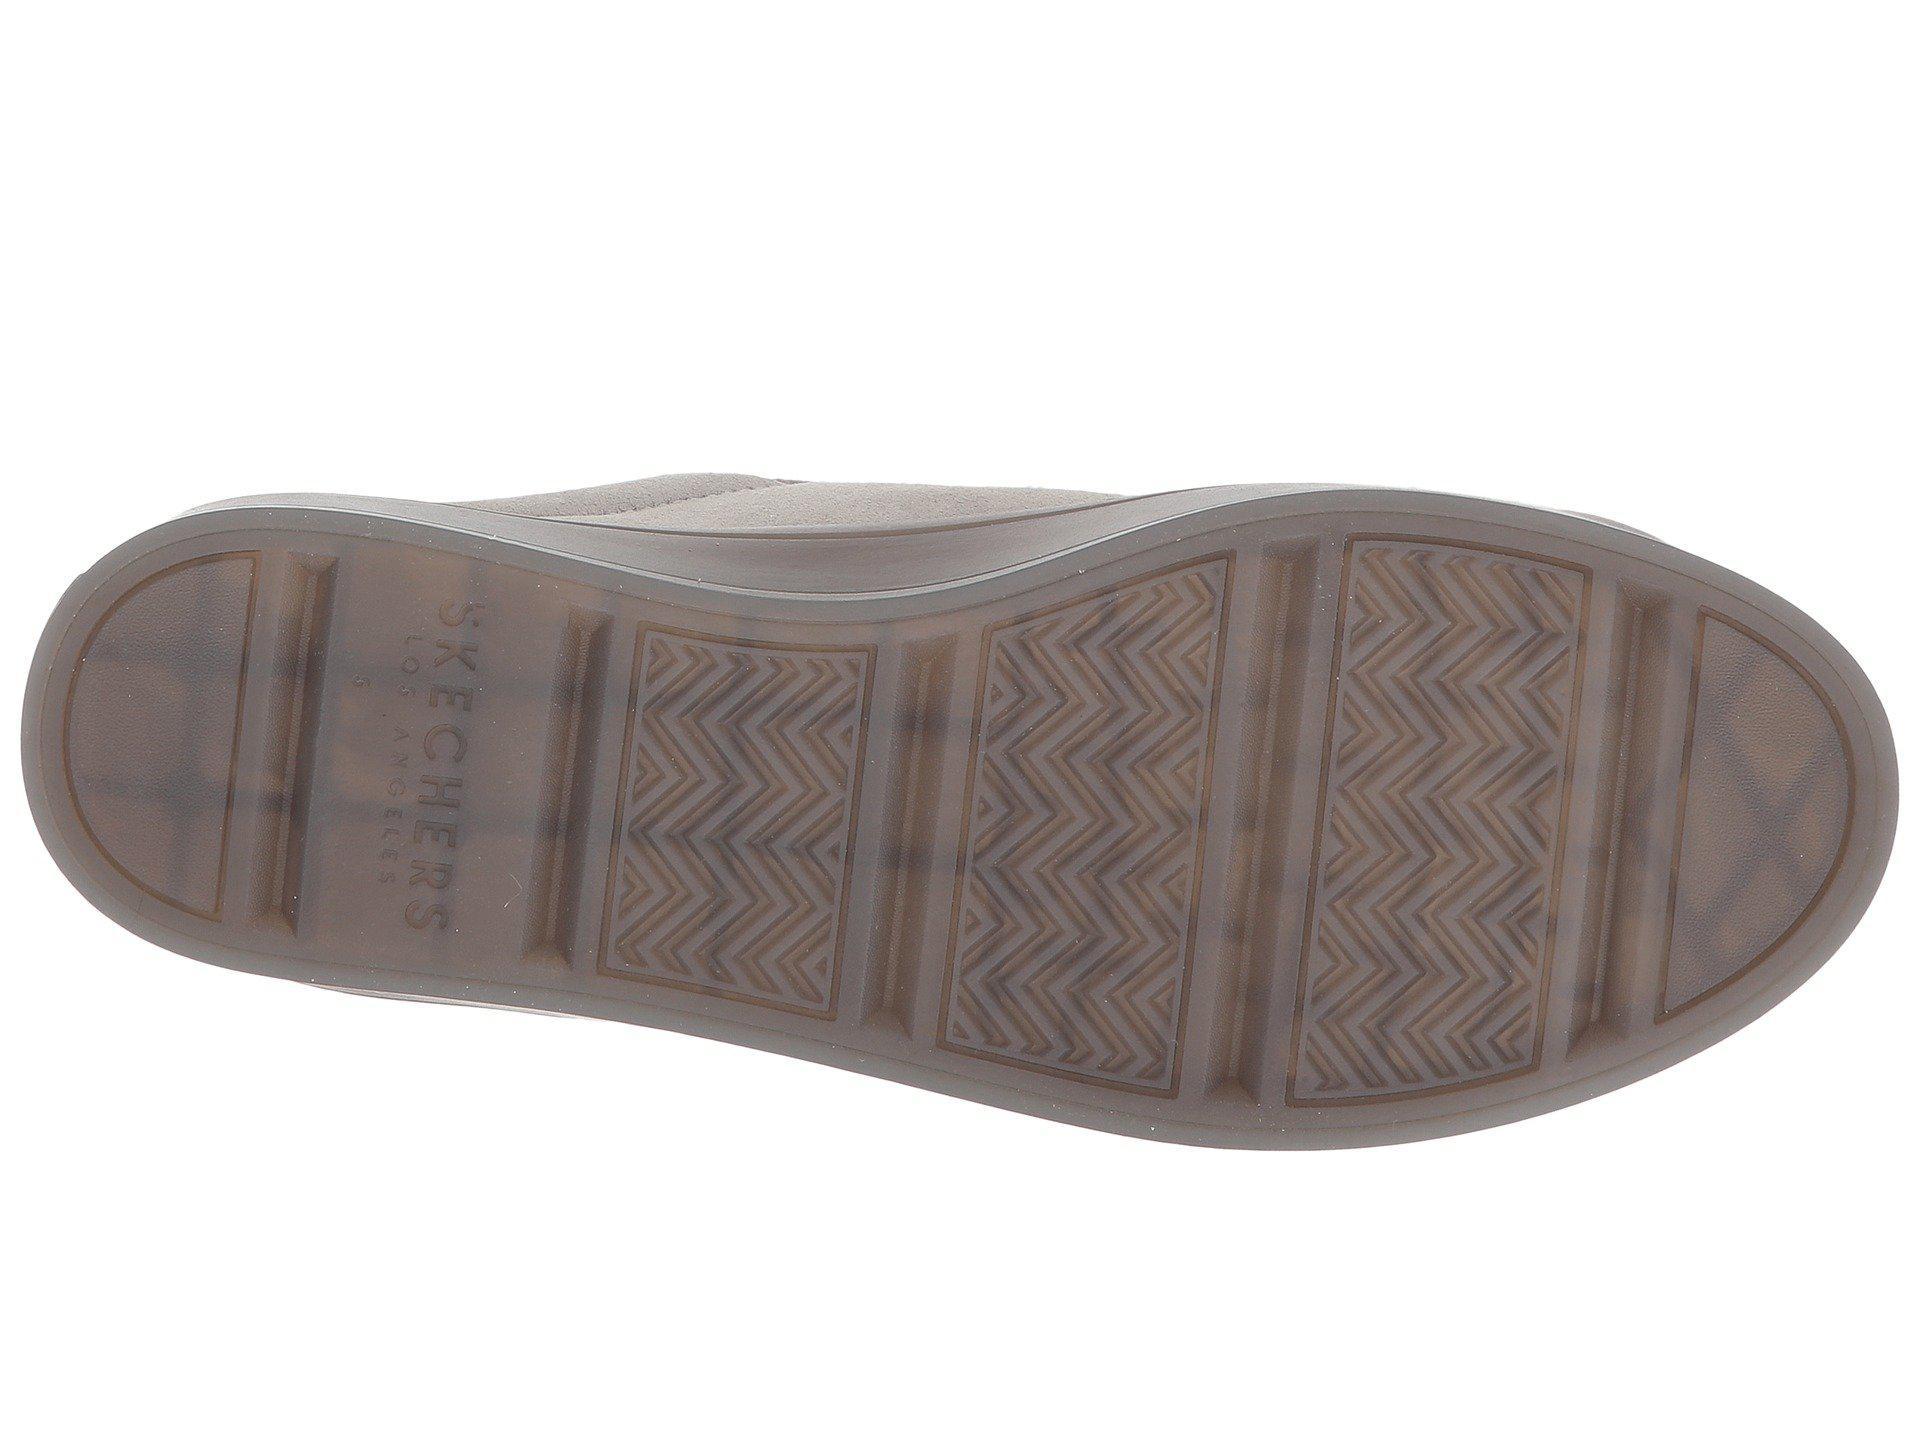 Skechers Shoes Lite Hi CitygrayLace Suede Up Casual uFJ531TcKl